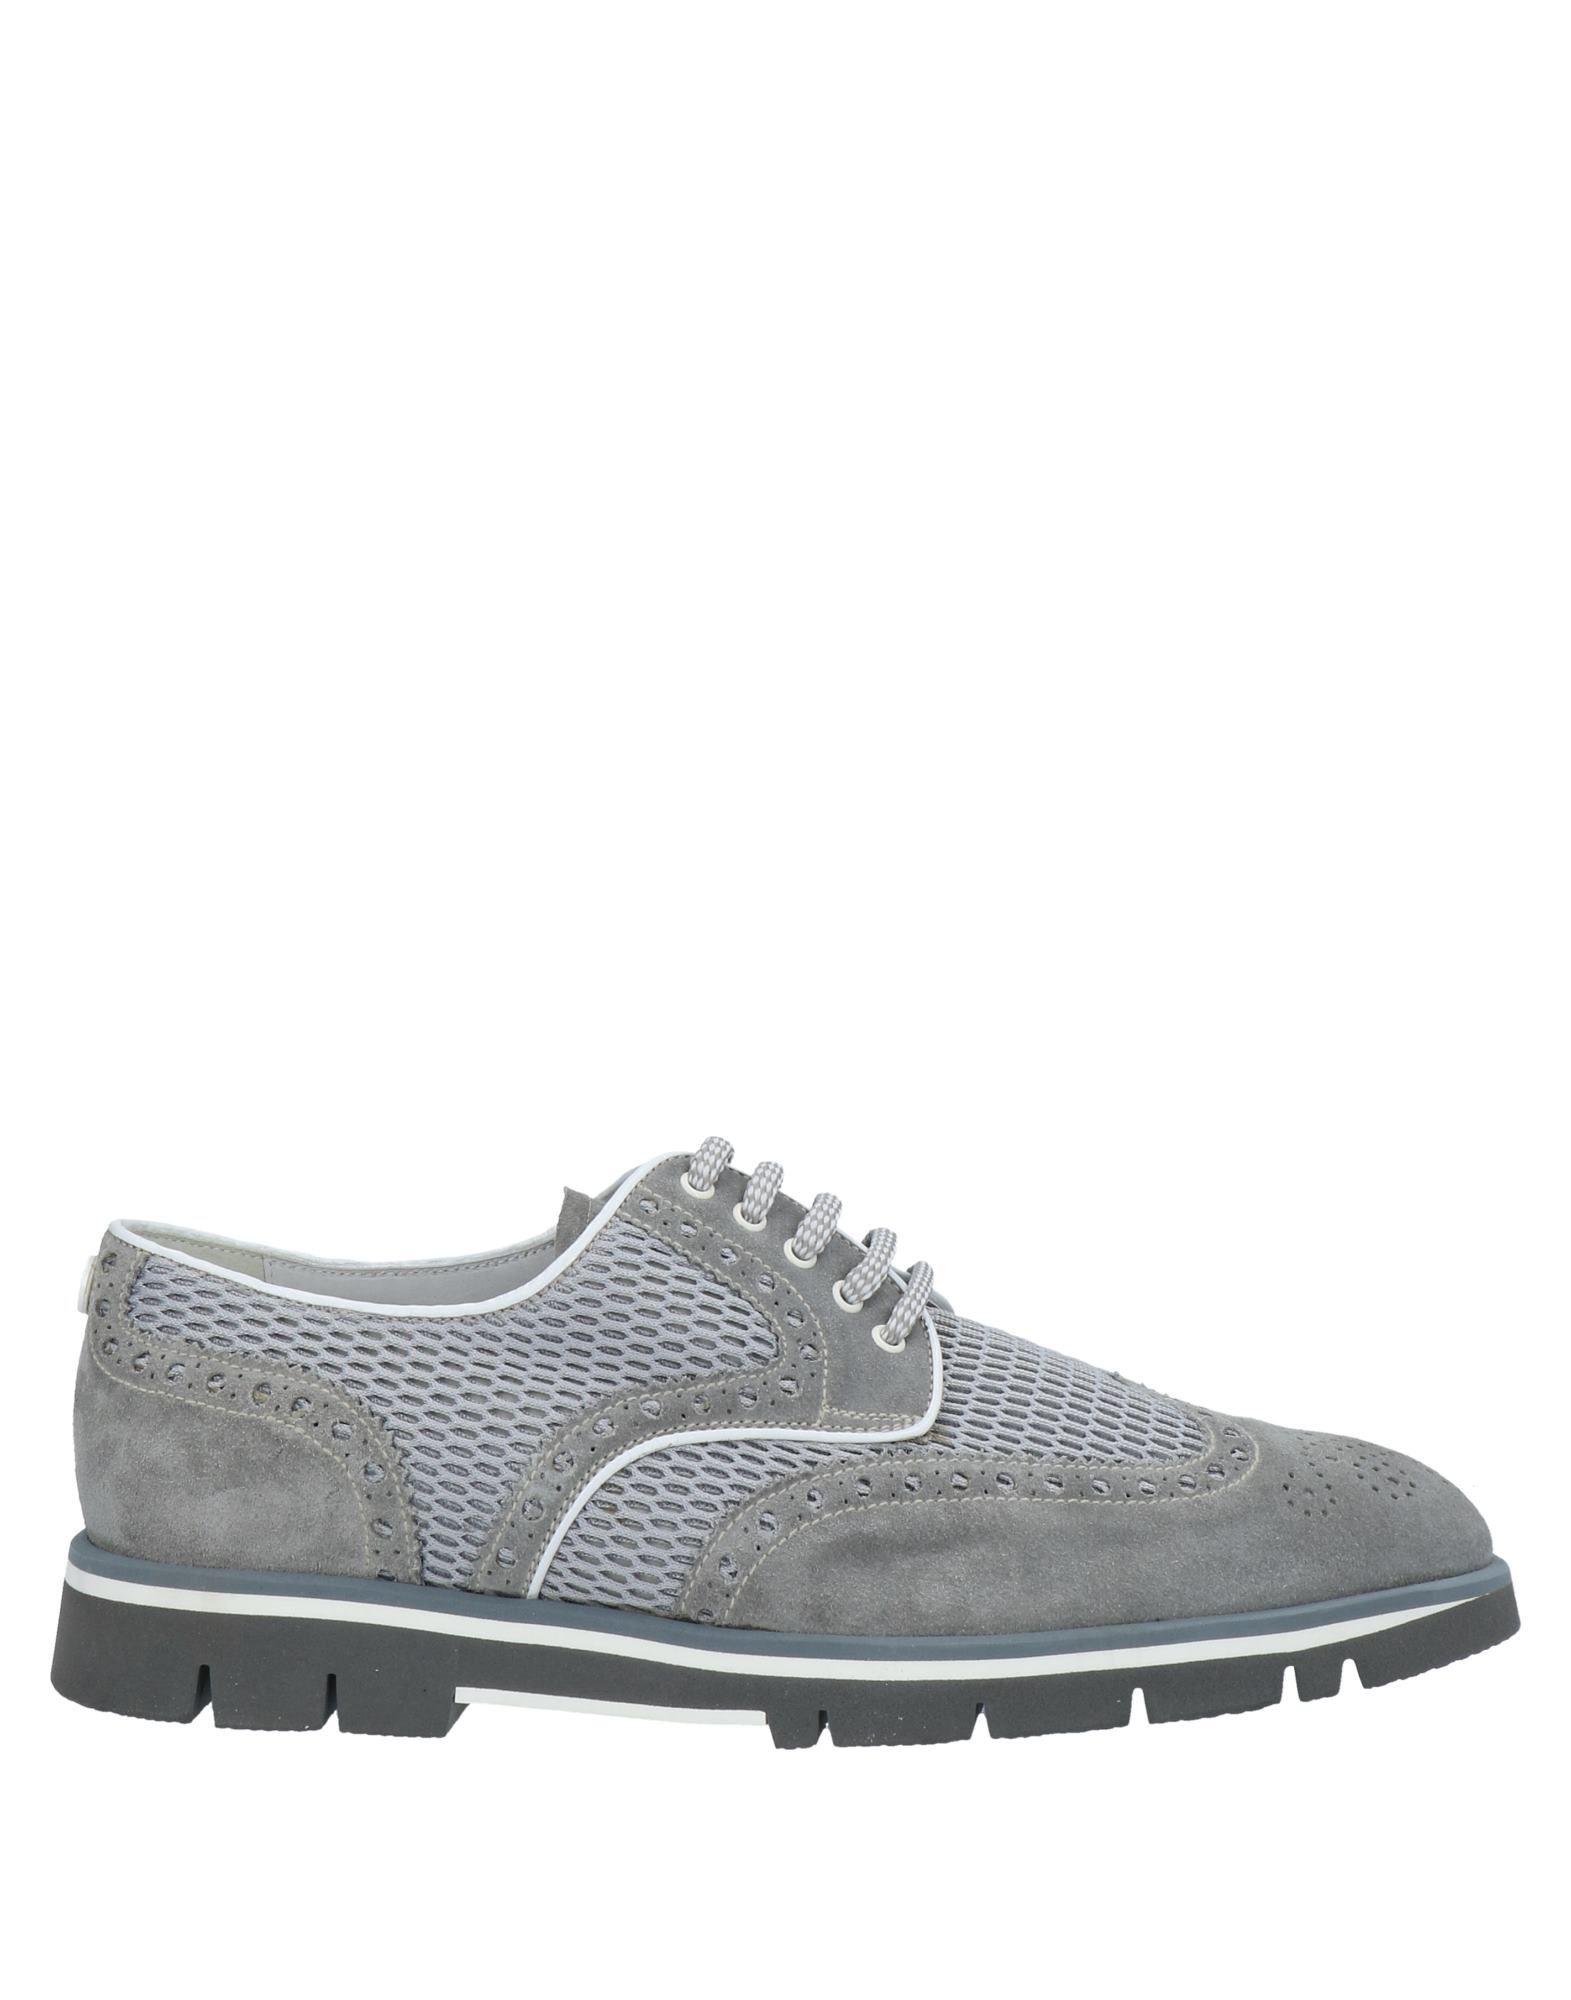 BLU|BARRETT by BARRETT Обувь на шнурках barrett обувь на шнурках